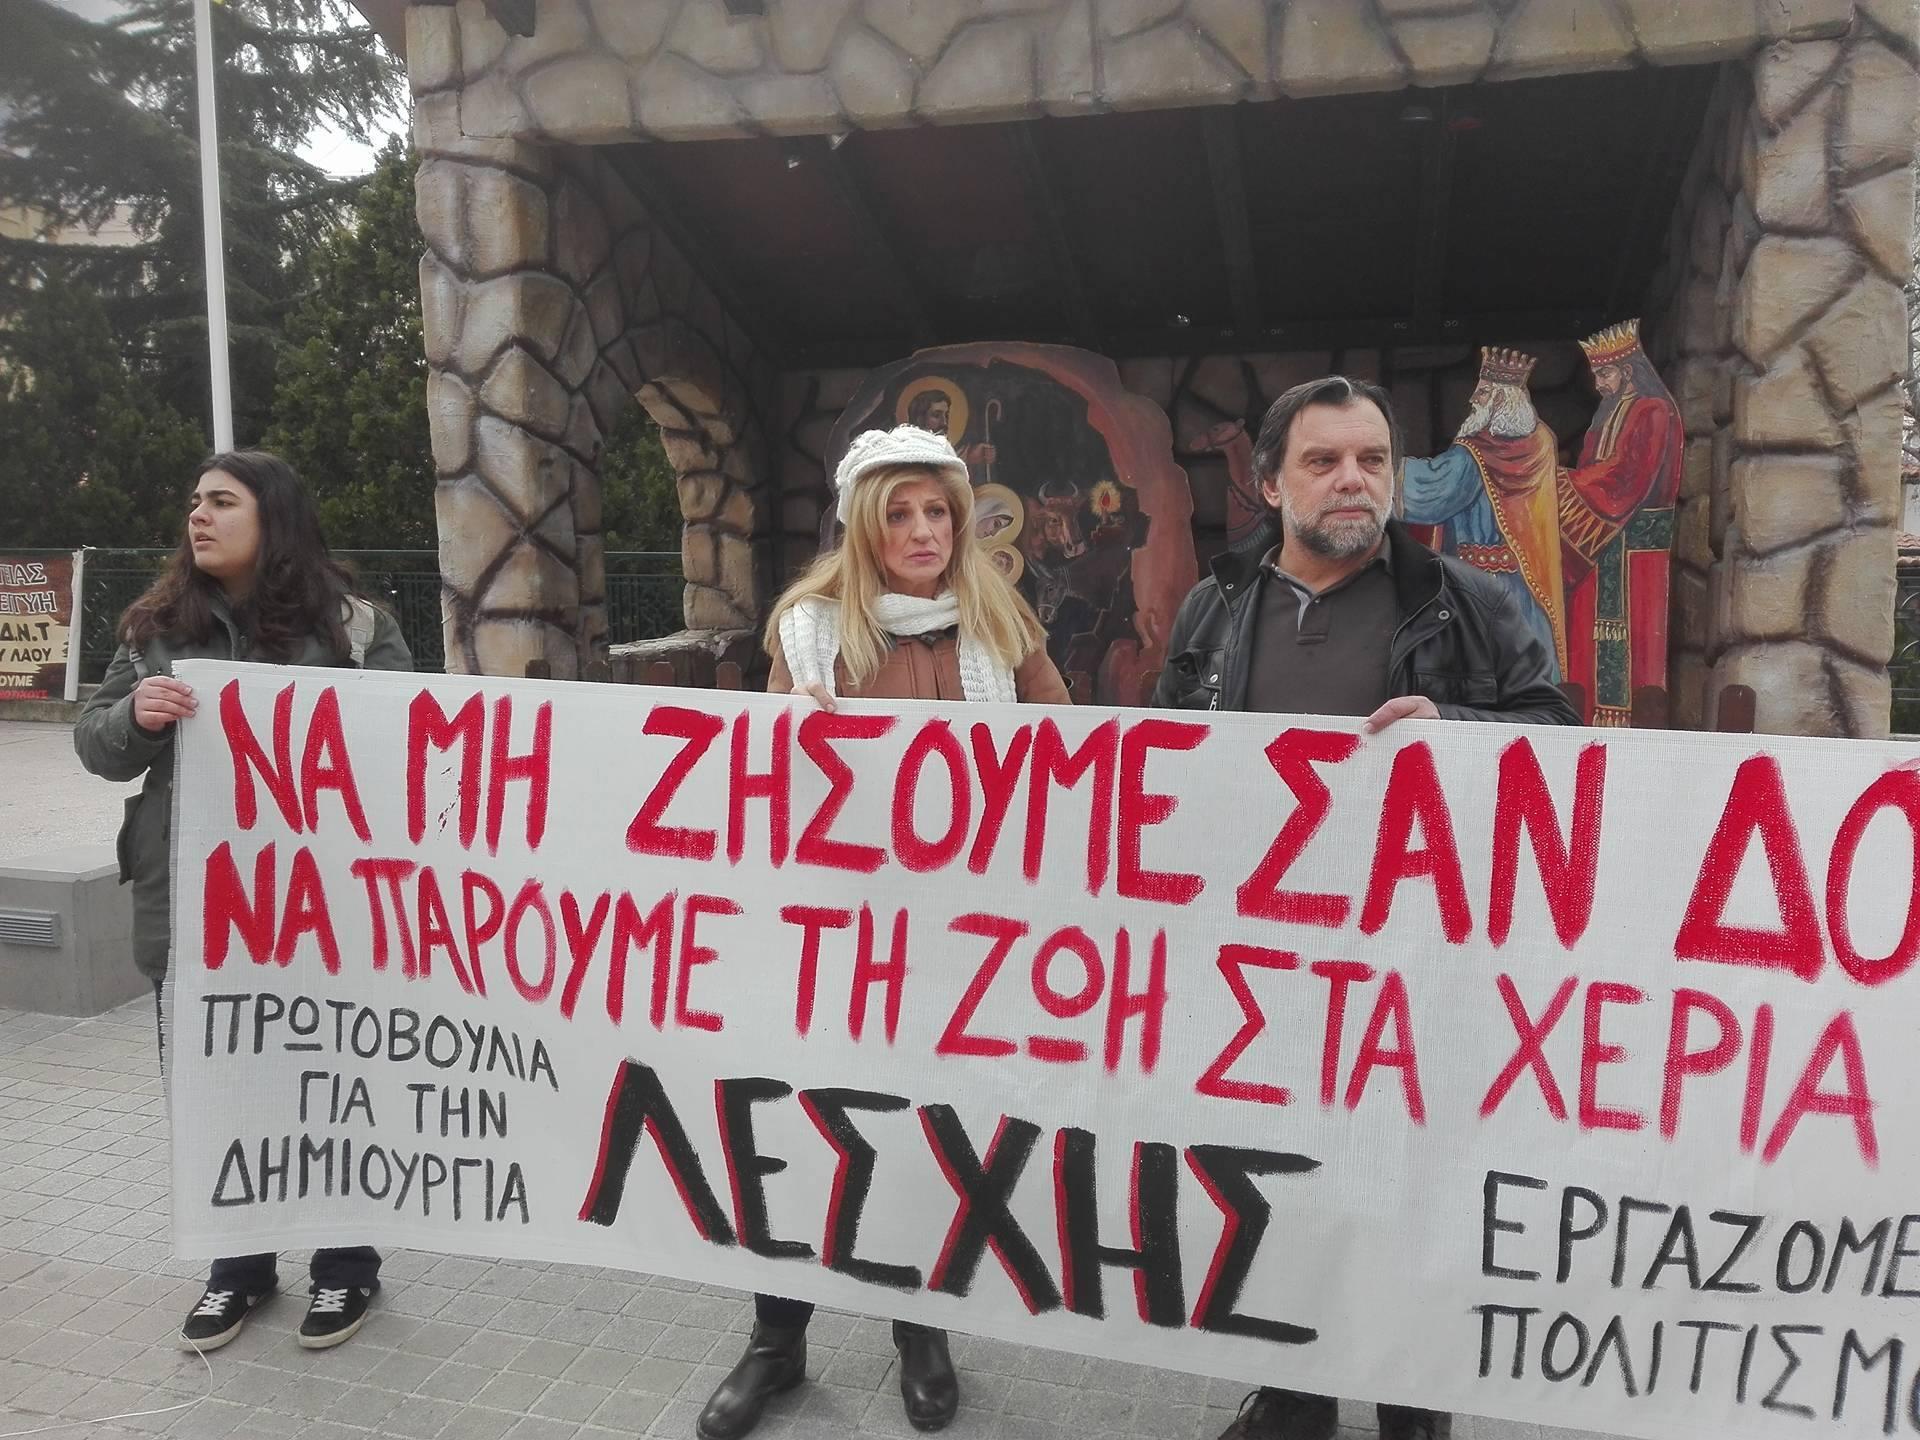 kozan.gr: H σημερινή απεργιακή συγκέντρωση της Εργατικής Αλληλεγγύης στην Κοζάνη  (Φωτογραφίες & Βίντεο)